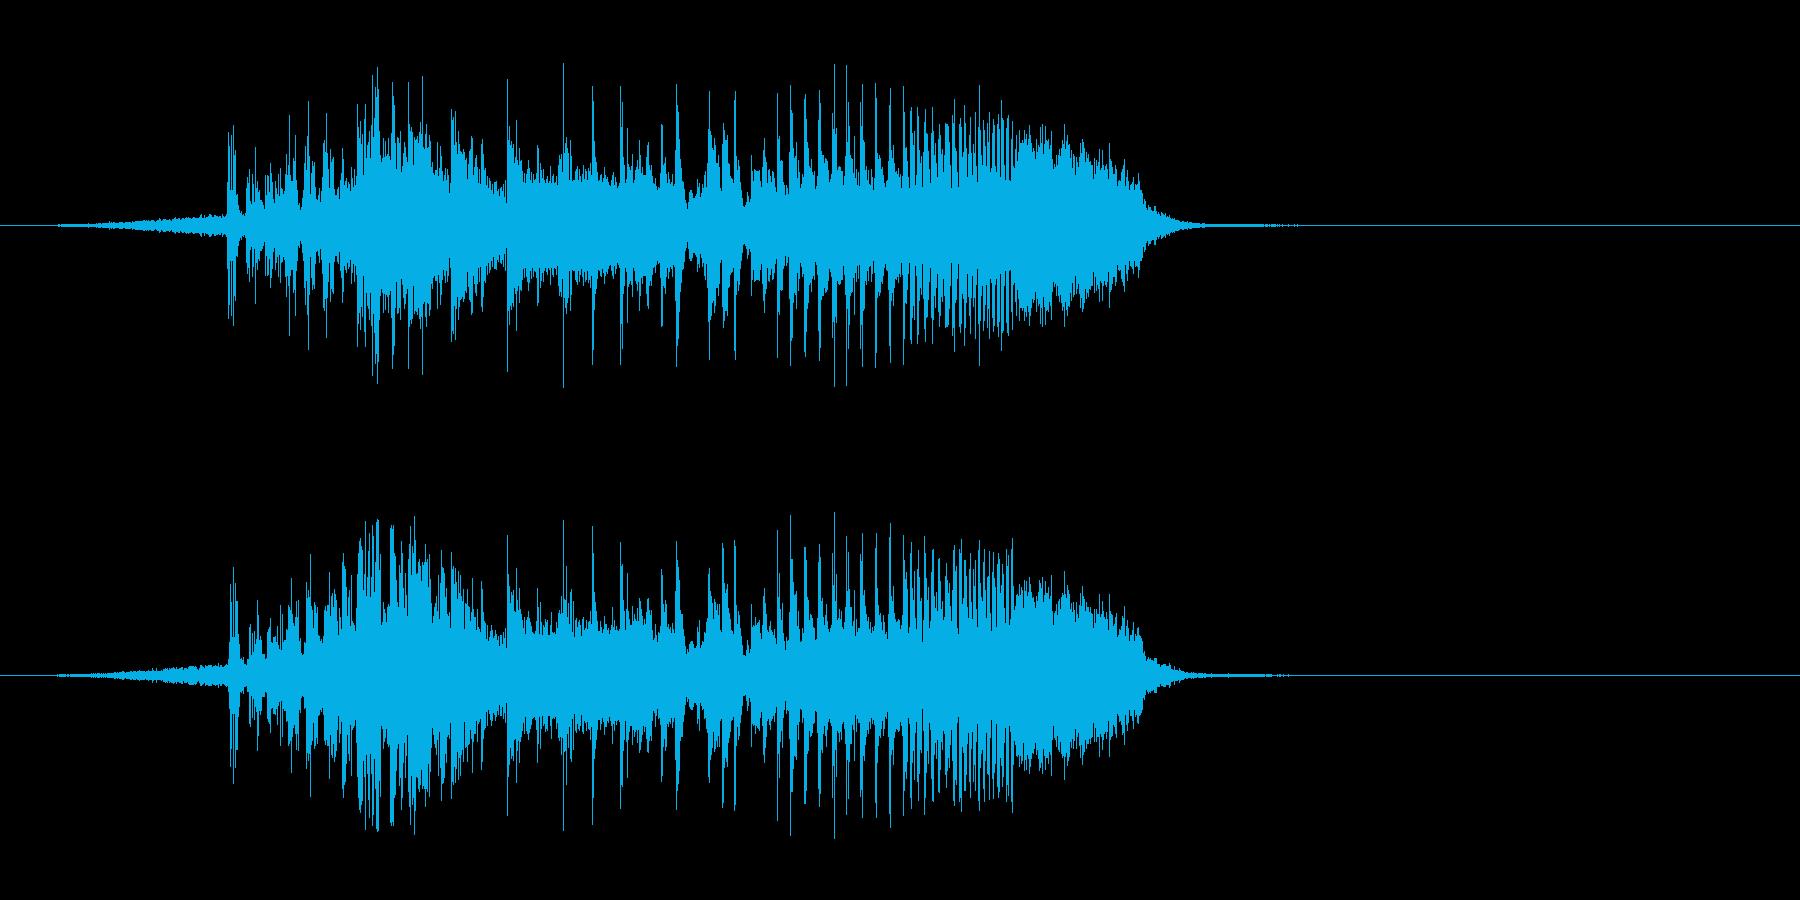 【DJジングル・EDM】オープニングAの再生済みの波形